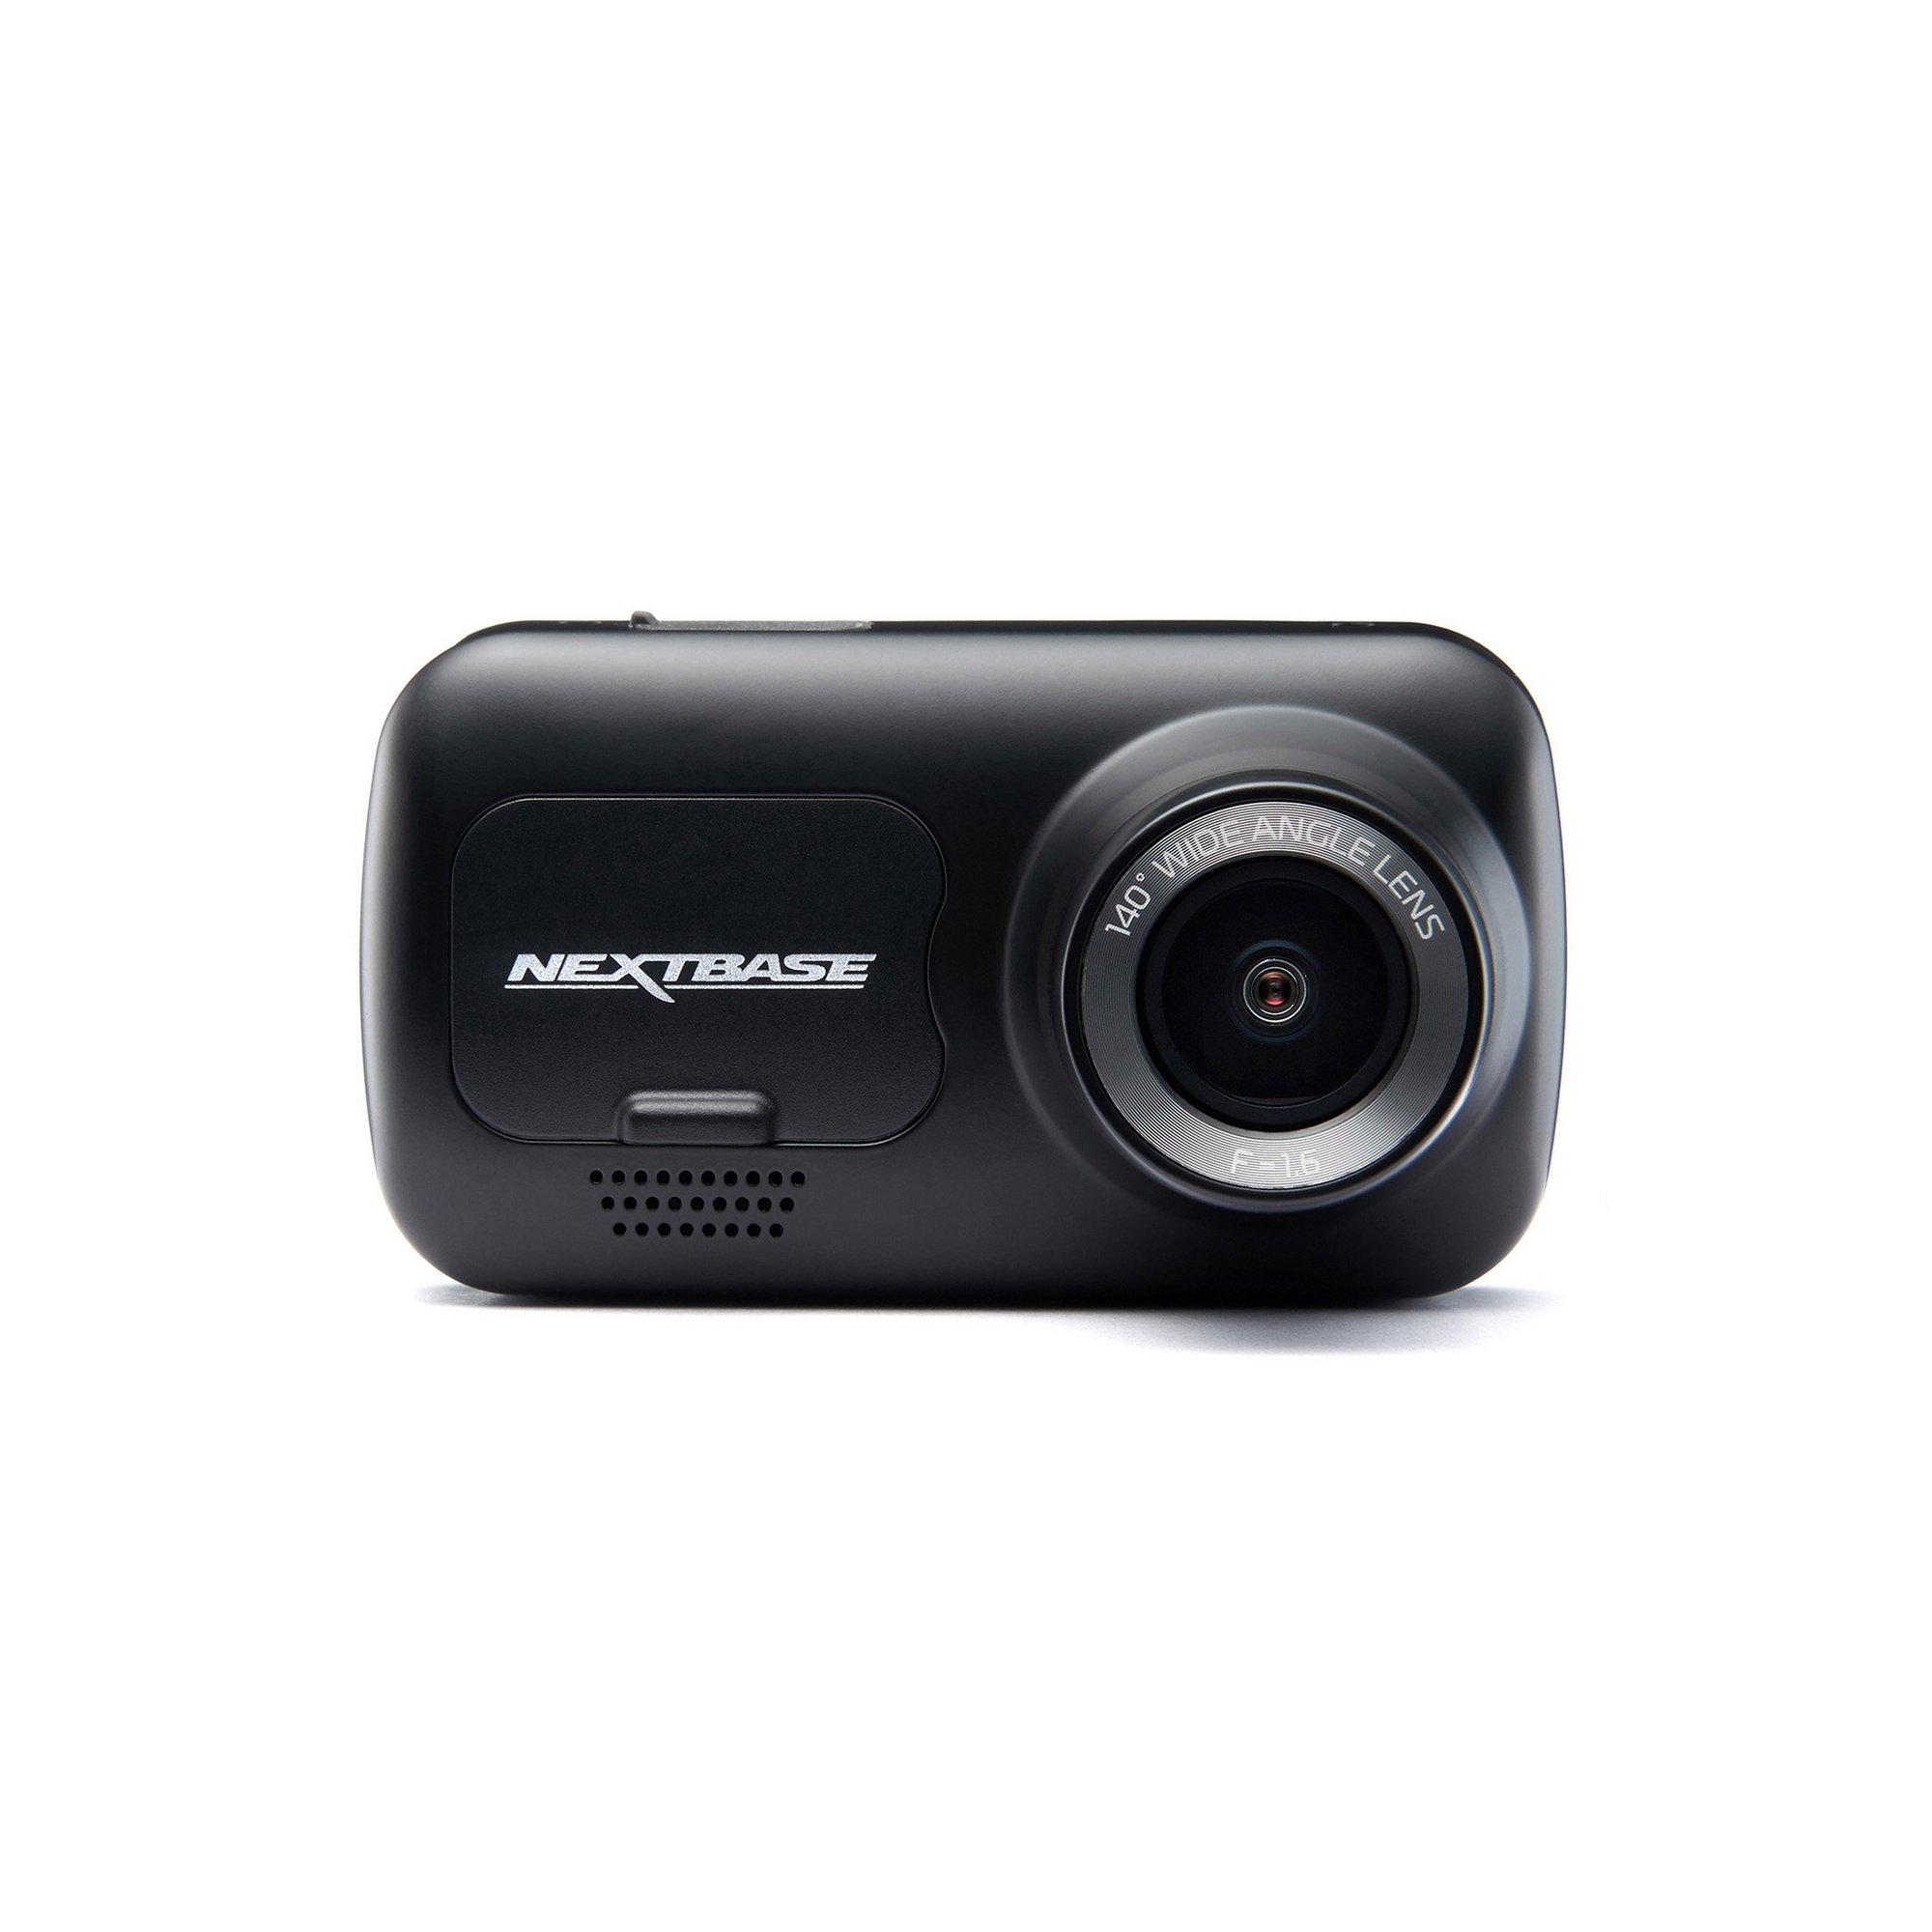 Image of Nextbase 222 FHD 2.5 Inch Dash Cam